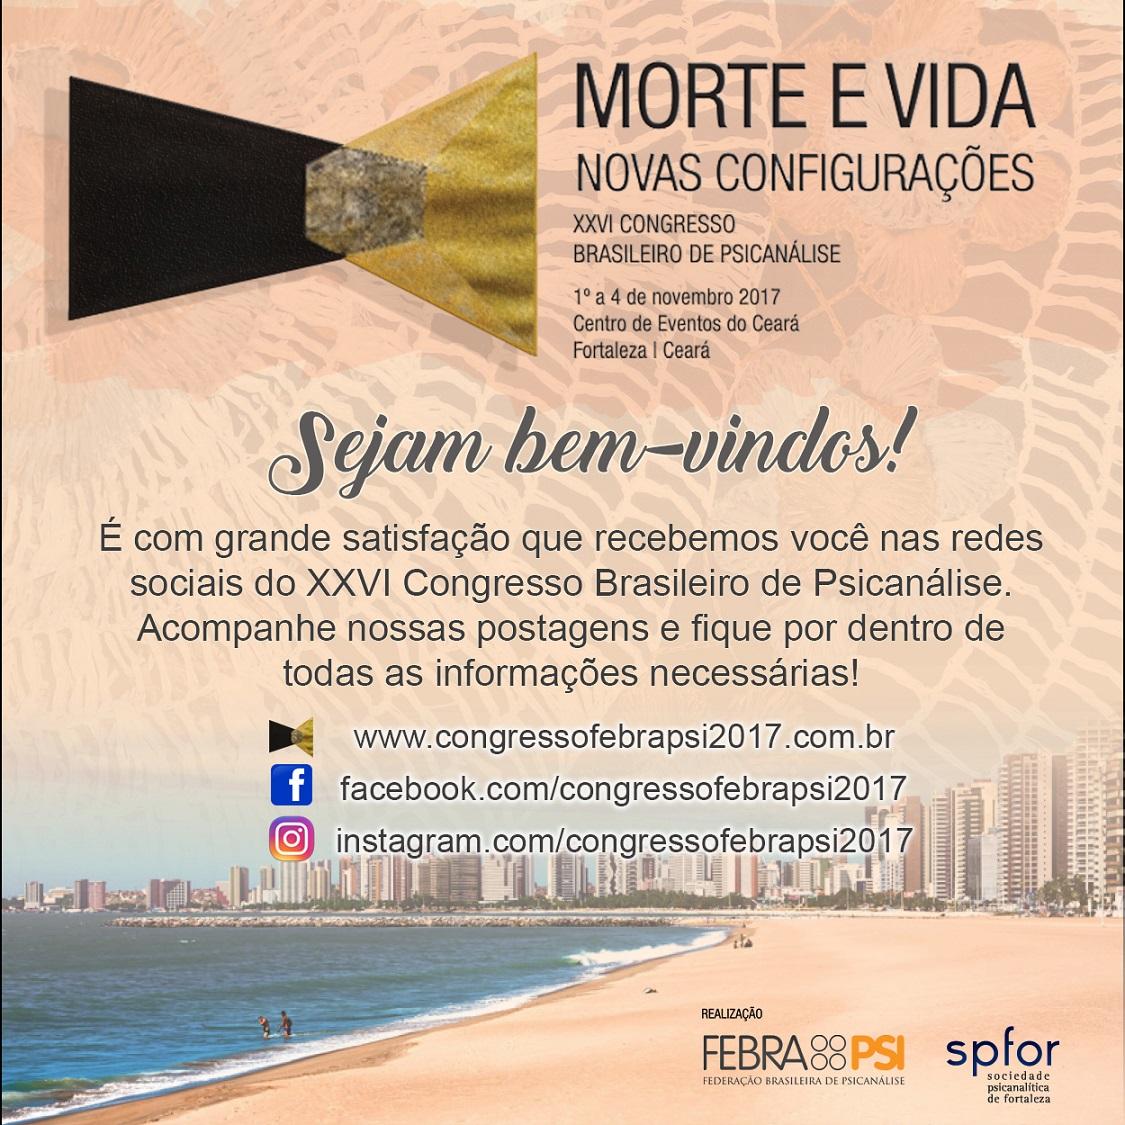 XXVI Congresso Brasileiro de Psicanálise